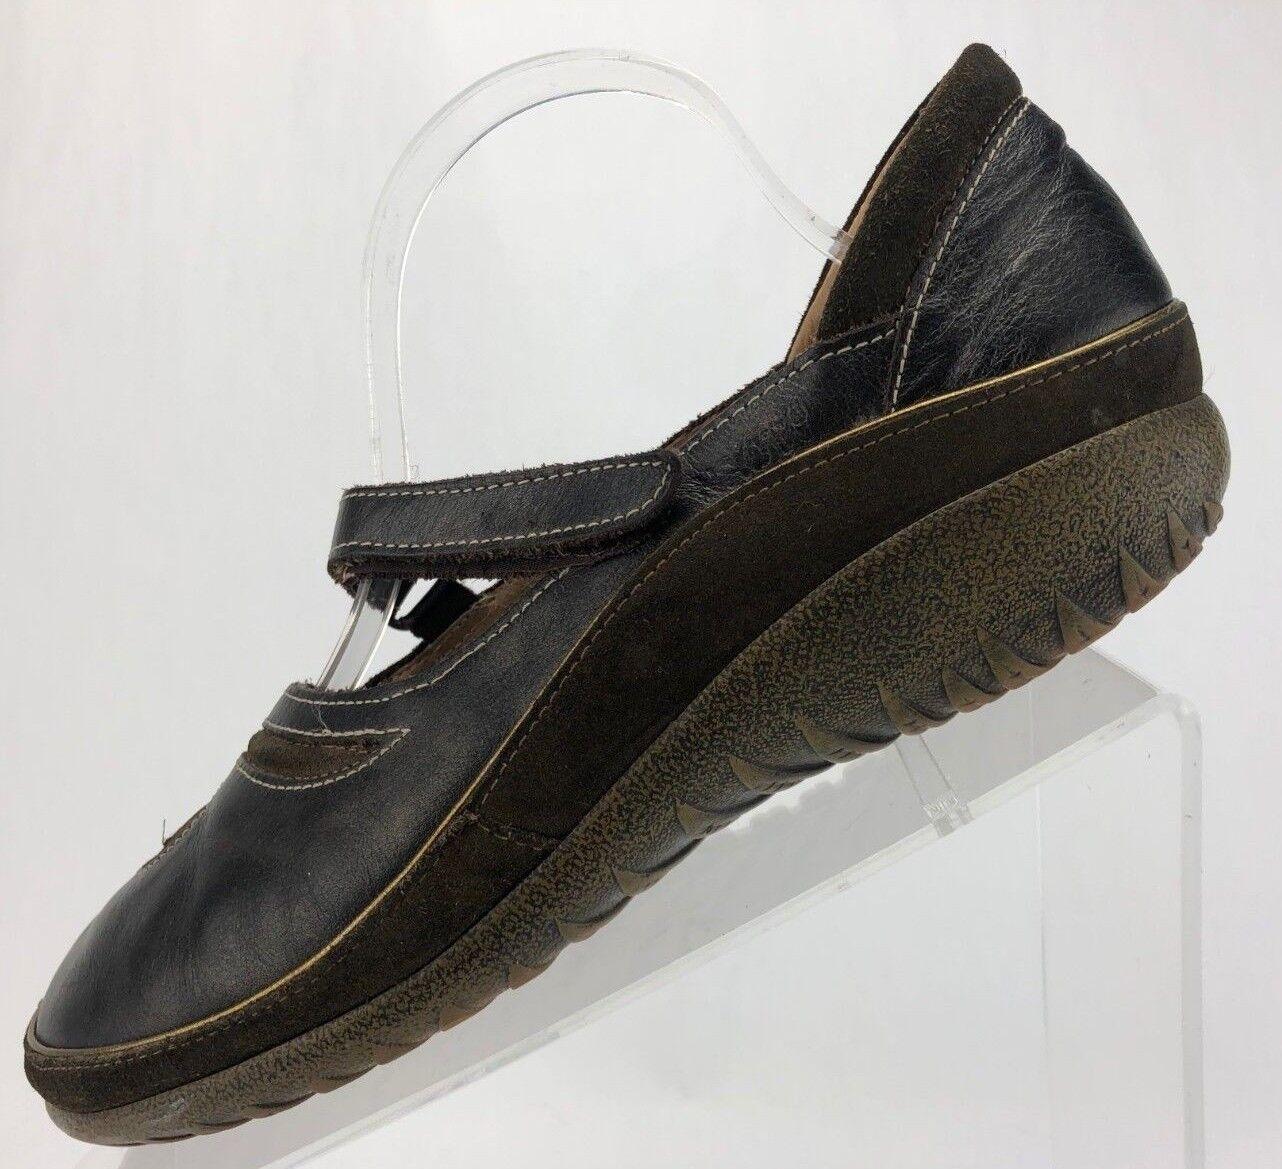 grandi risparmi Naot Matai Comfort Casual Walking Walking Walking Leather Mary Jane Flats donna 41,10.10.5 Brwn  edizione limitata a caldo